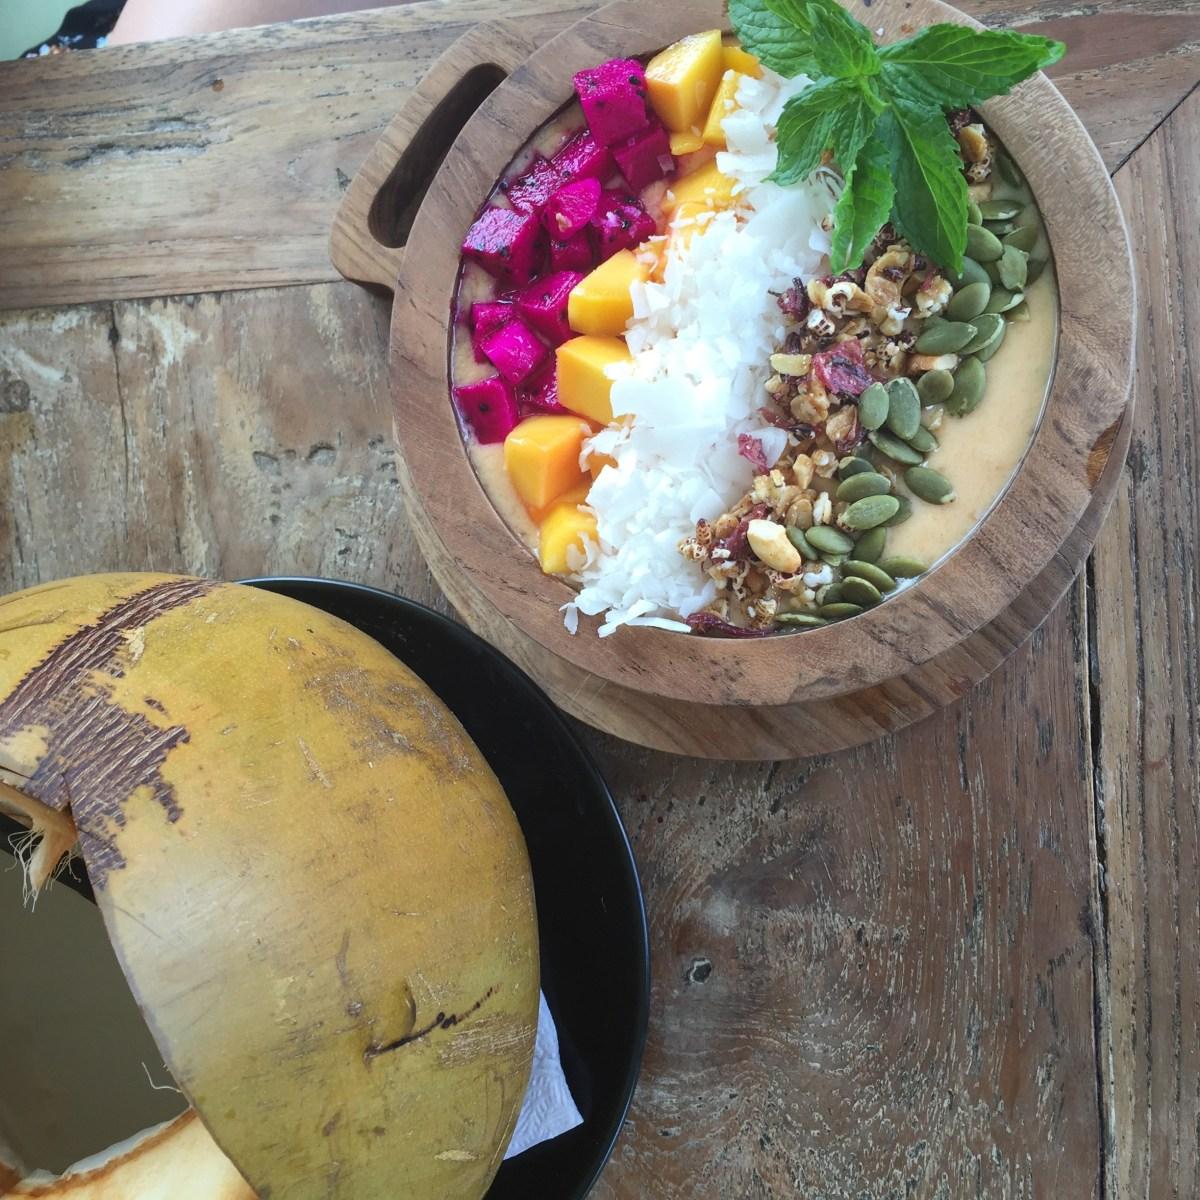 Nook, Seminyak, Bali